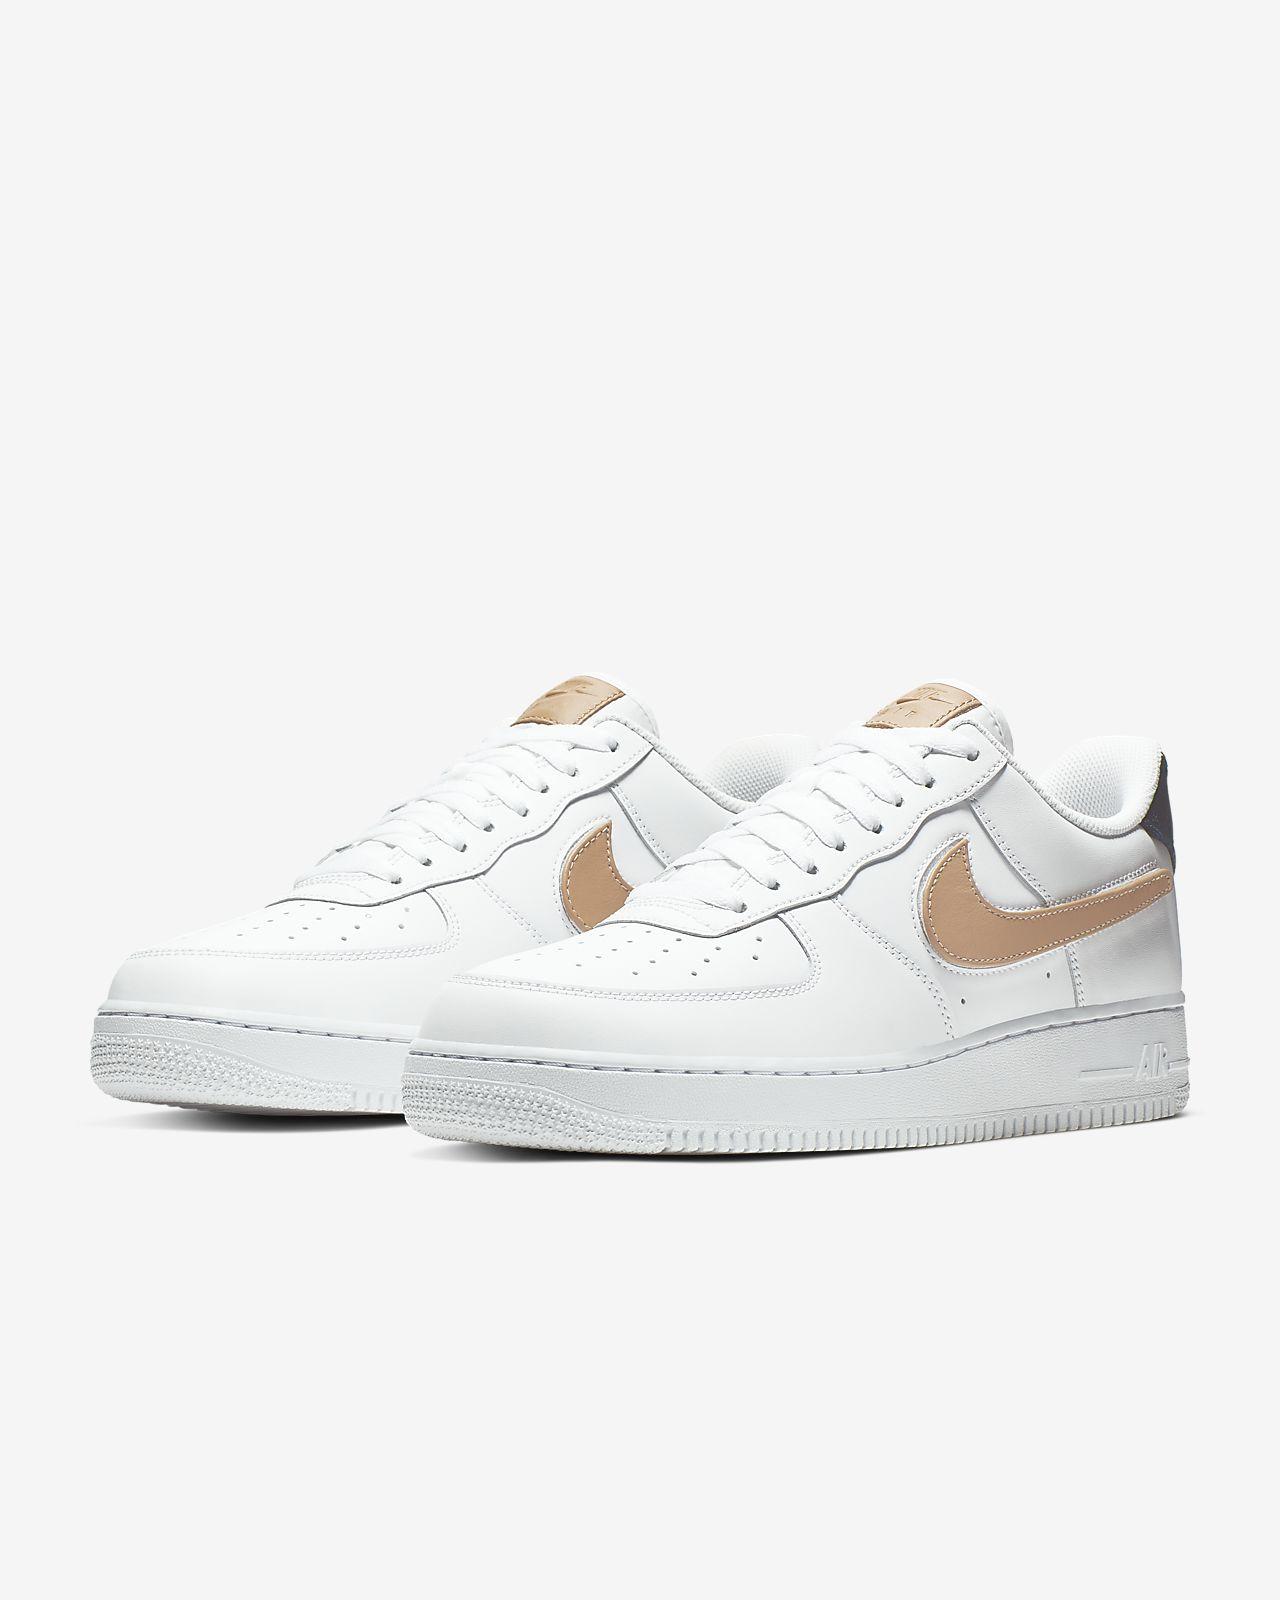 Zapatillas Nike Air Force 1 07 Lv8 3 Hombre